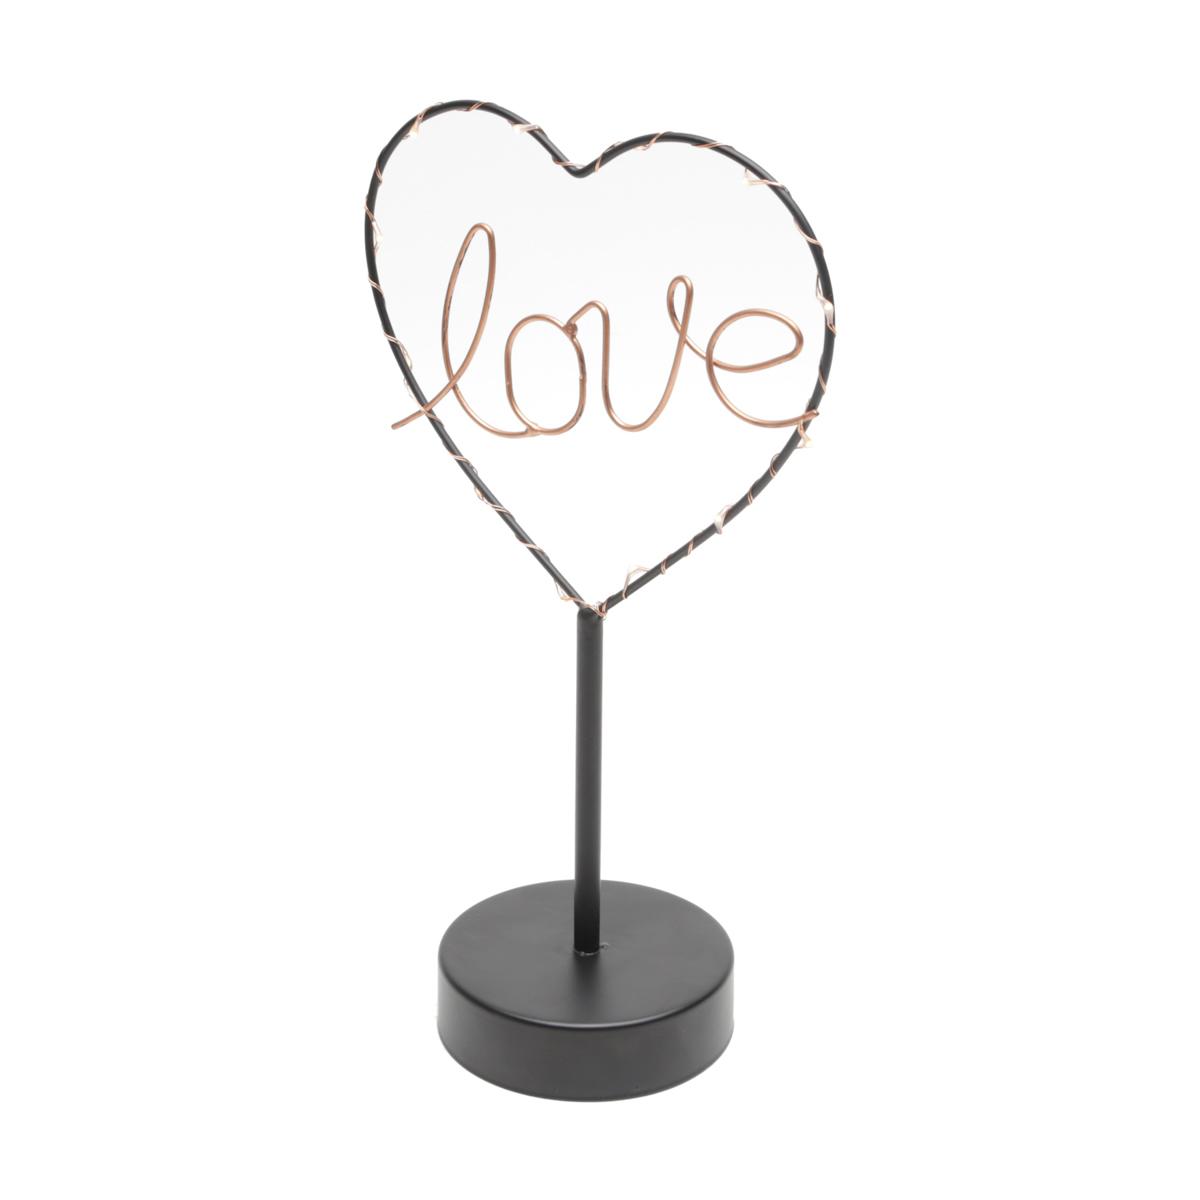 Luminária Mesa Metal Love Heart Com Led Preto 29.5 x 9.5 x 16.5 cm